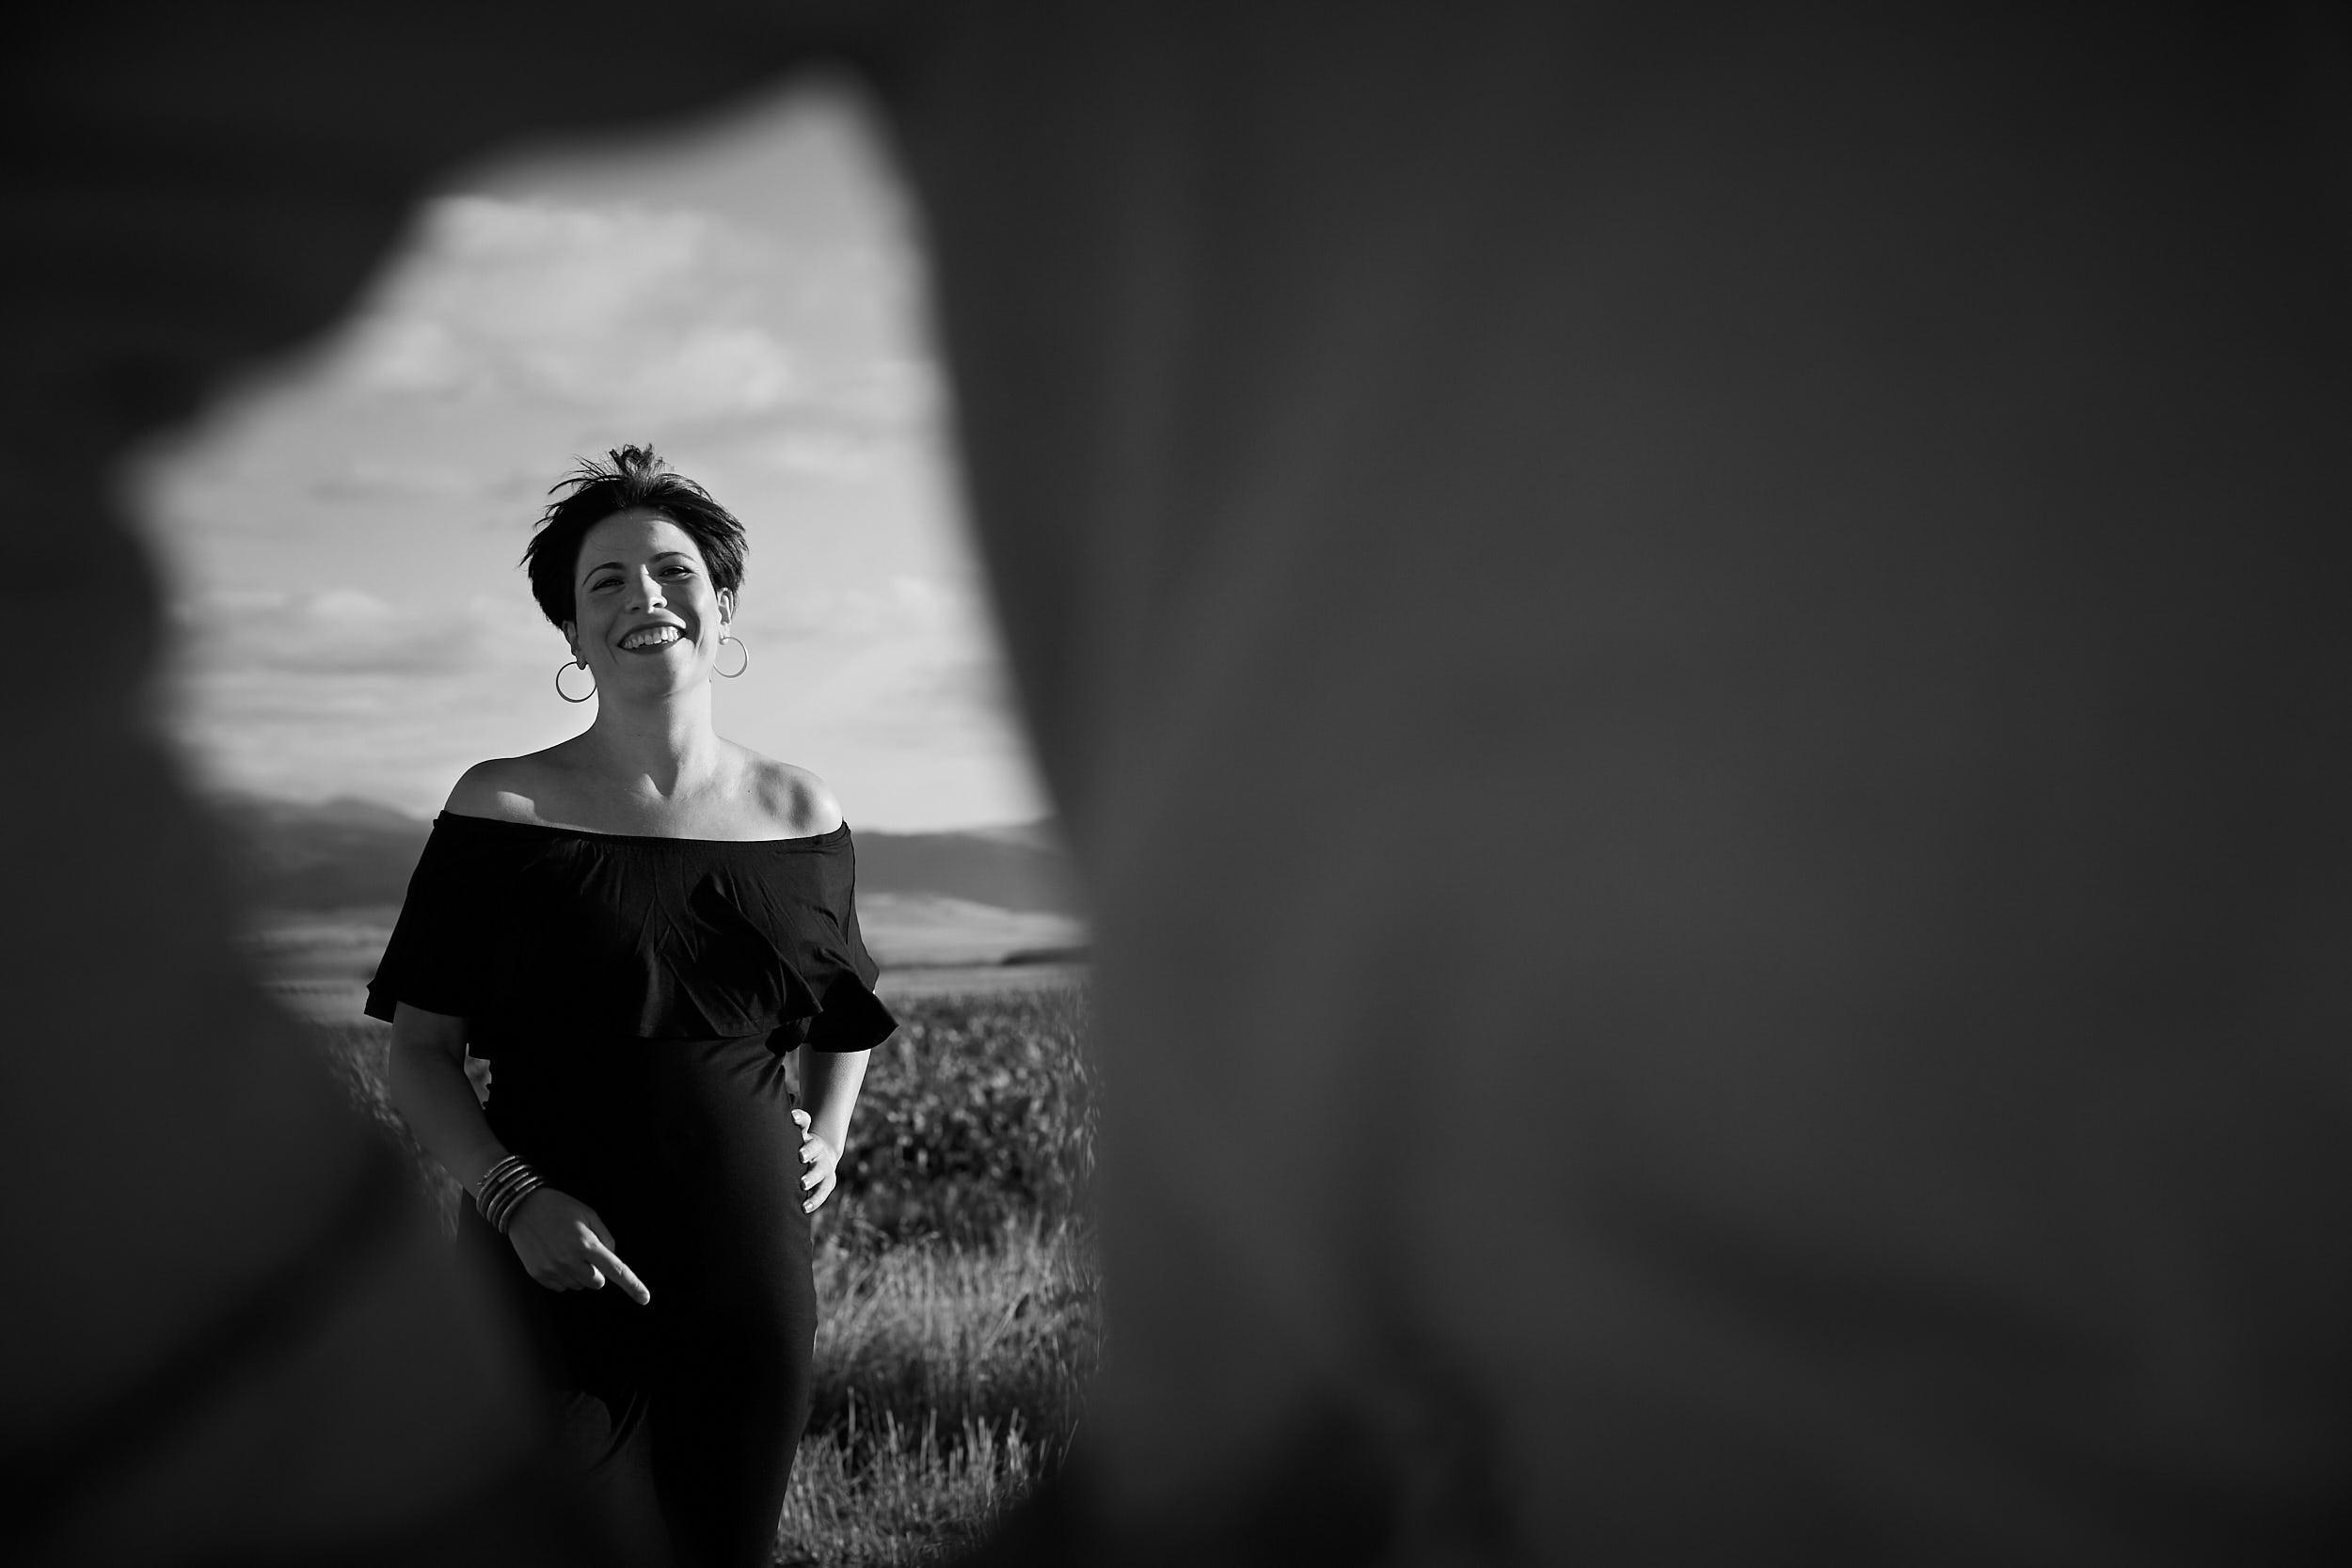 1708Basque_Country_Rioja_Portrait_Photographer_James_Sturcke_0017.jpg